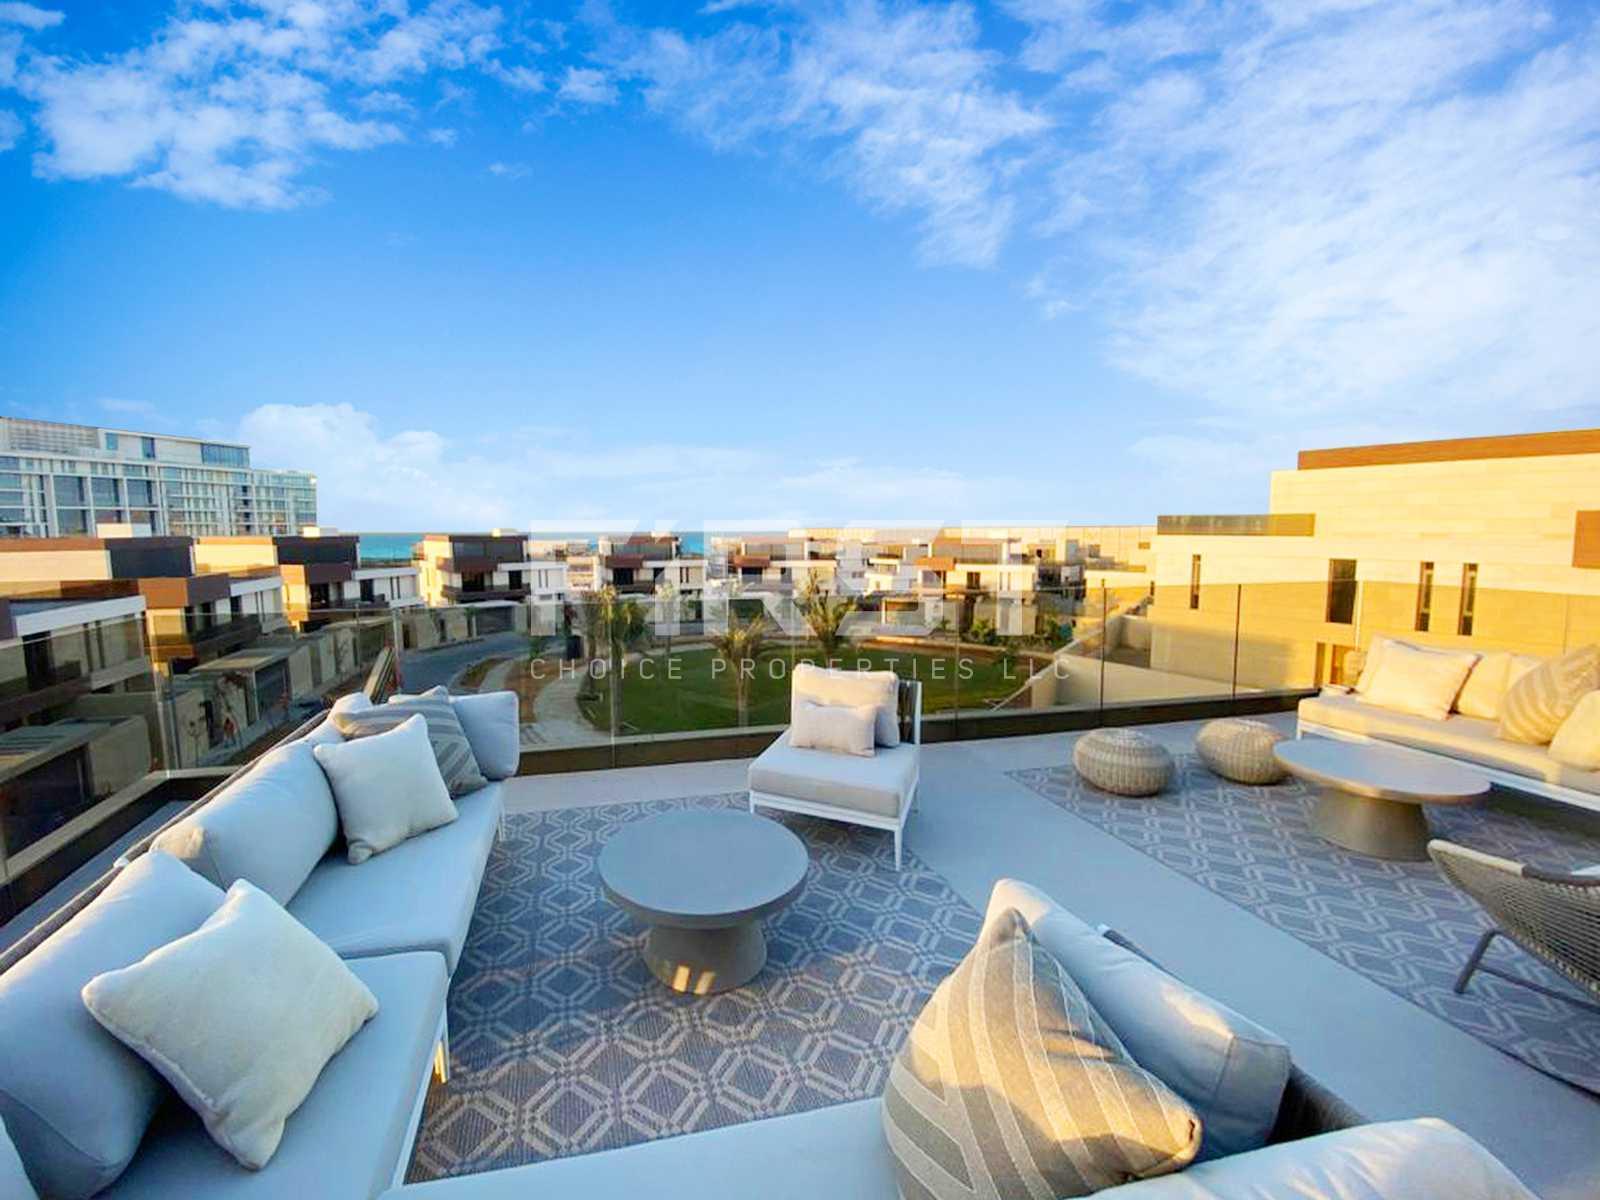 External Photo of Nudra Saadiyat Cultural Dirstrict Saadiyat Island Abu Dhabi UAE (10).jpg